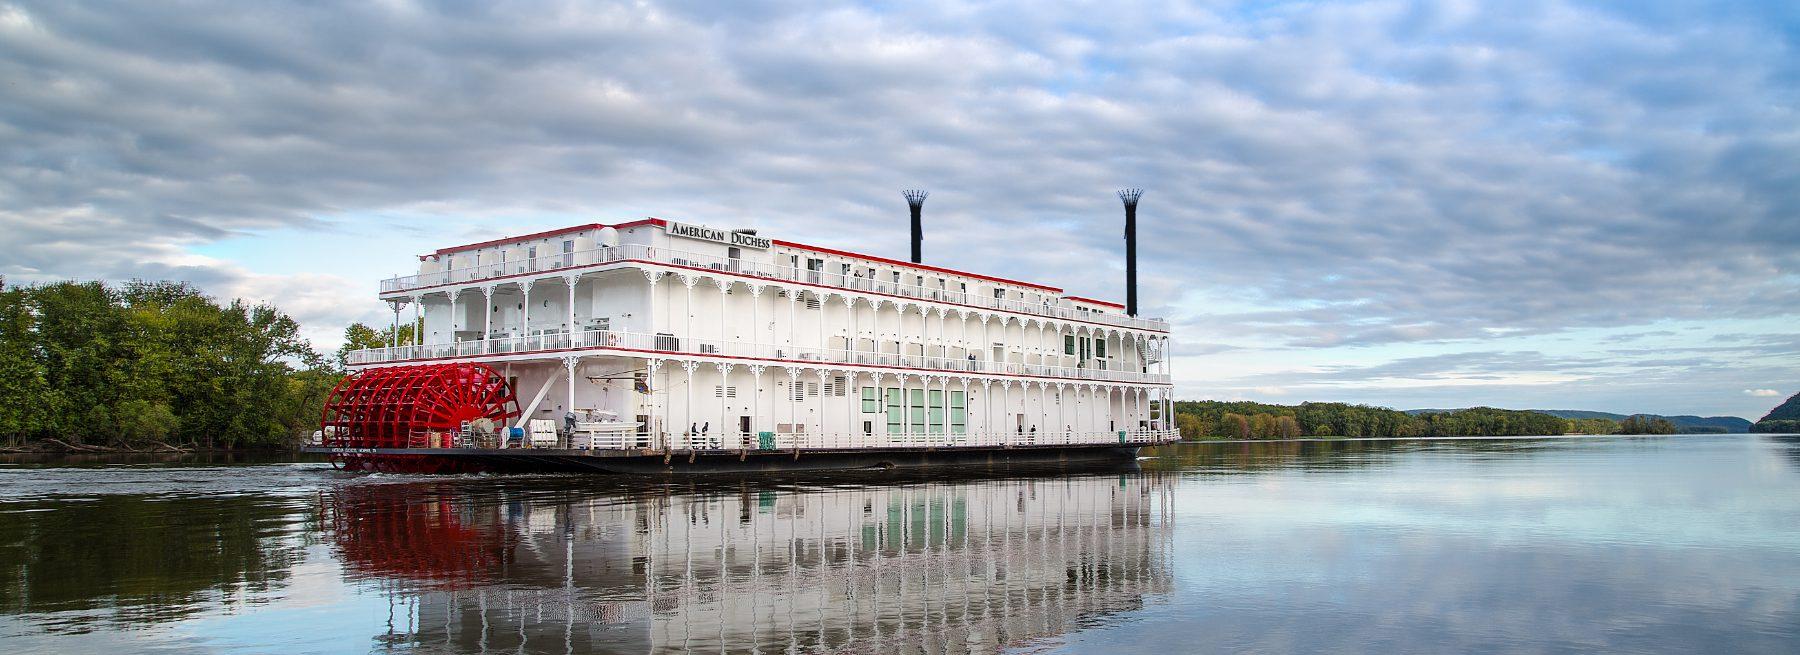 American Duchess sternwheeler boat on a river